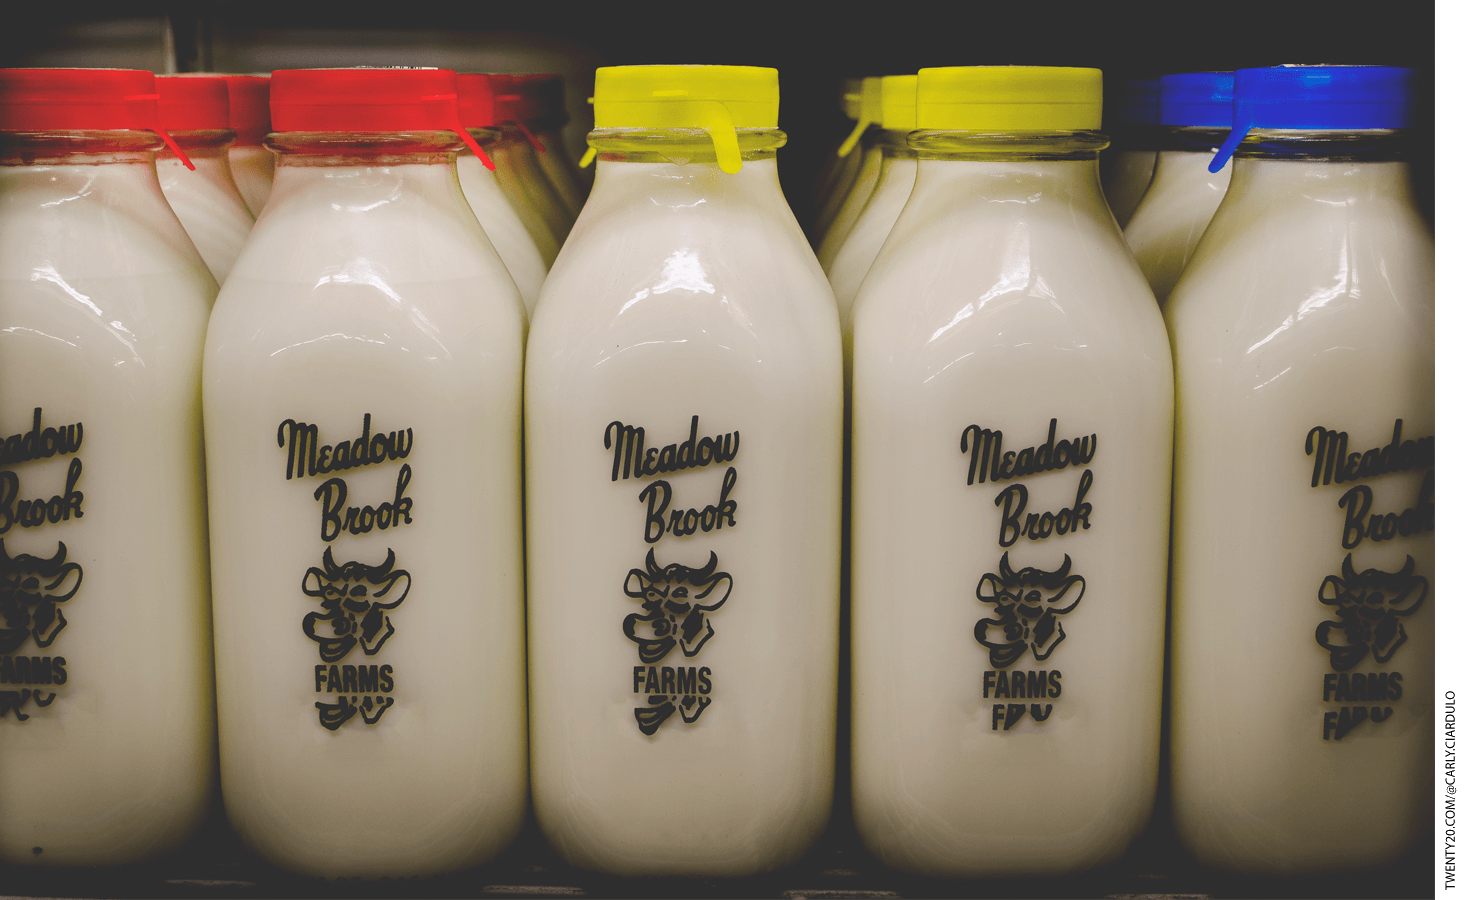 Dairy bottles on a shelf